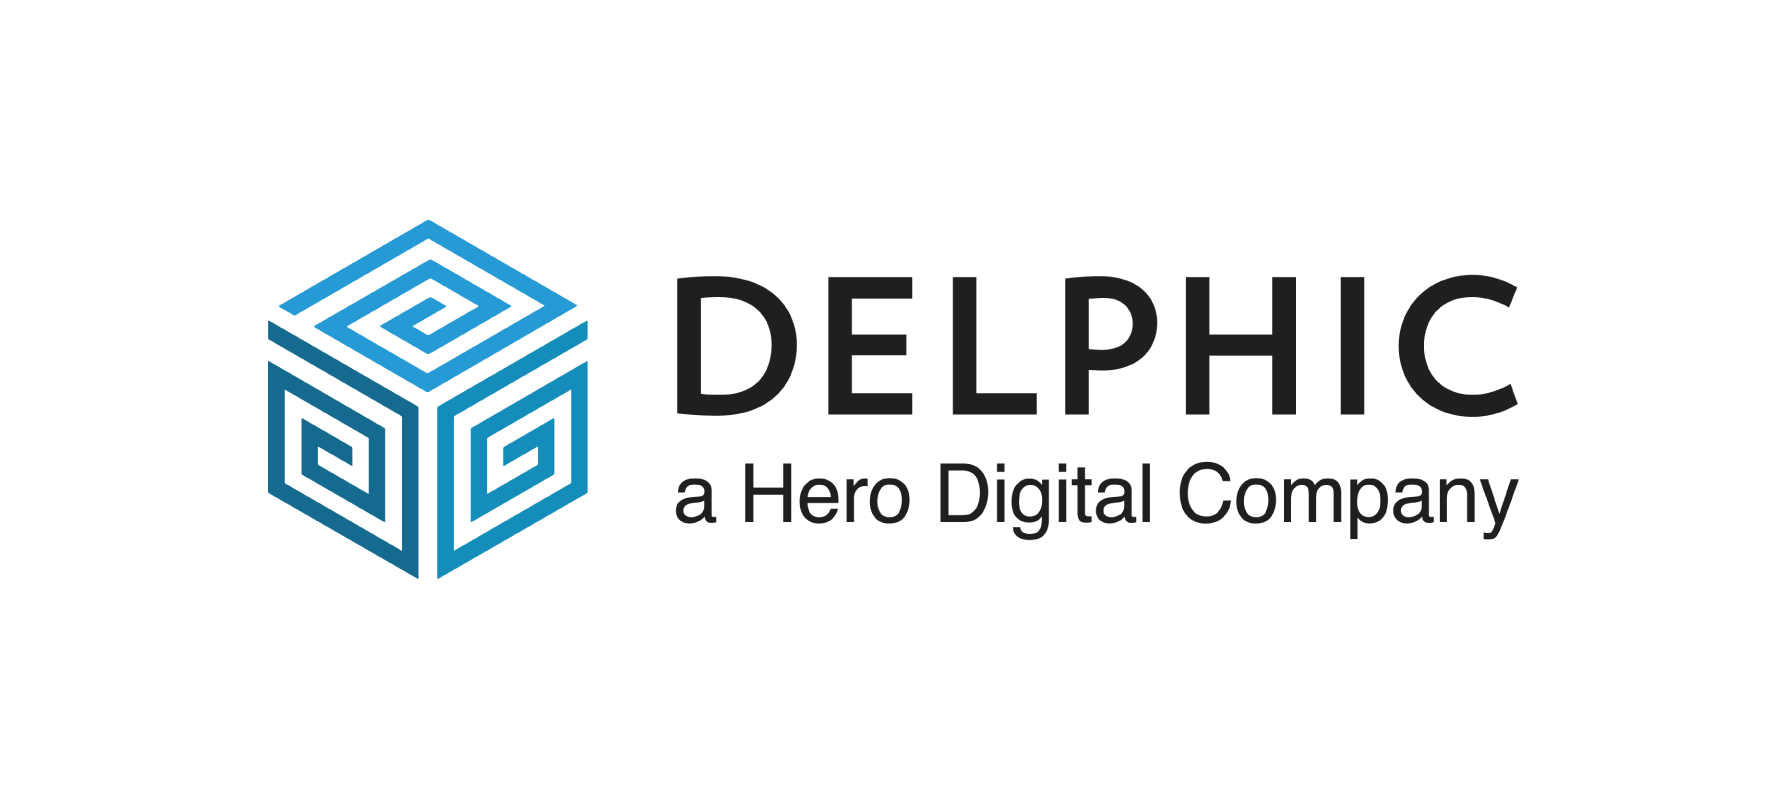 Delphic a Hero Digital Company logo